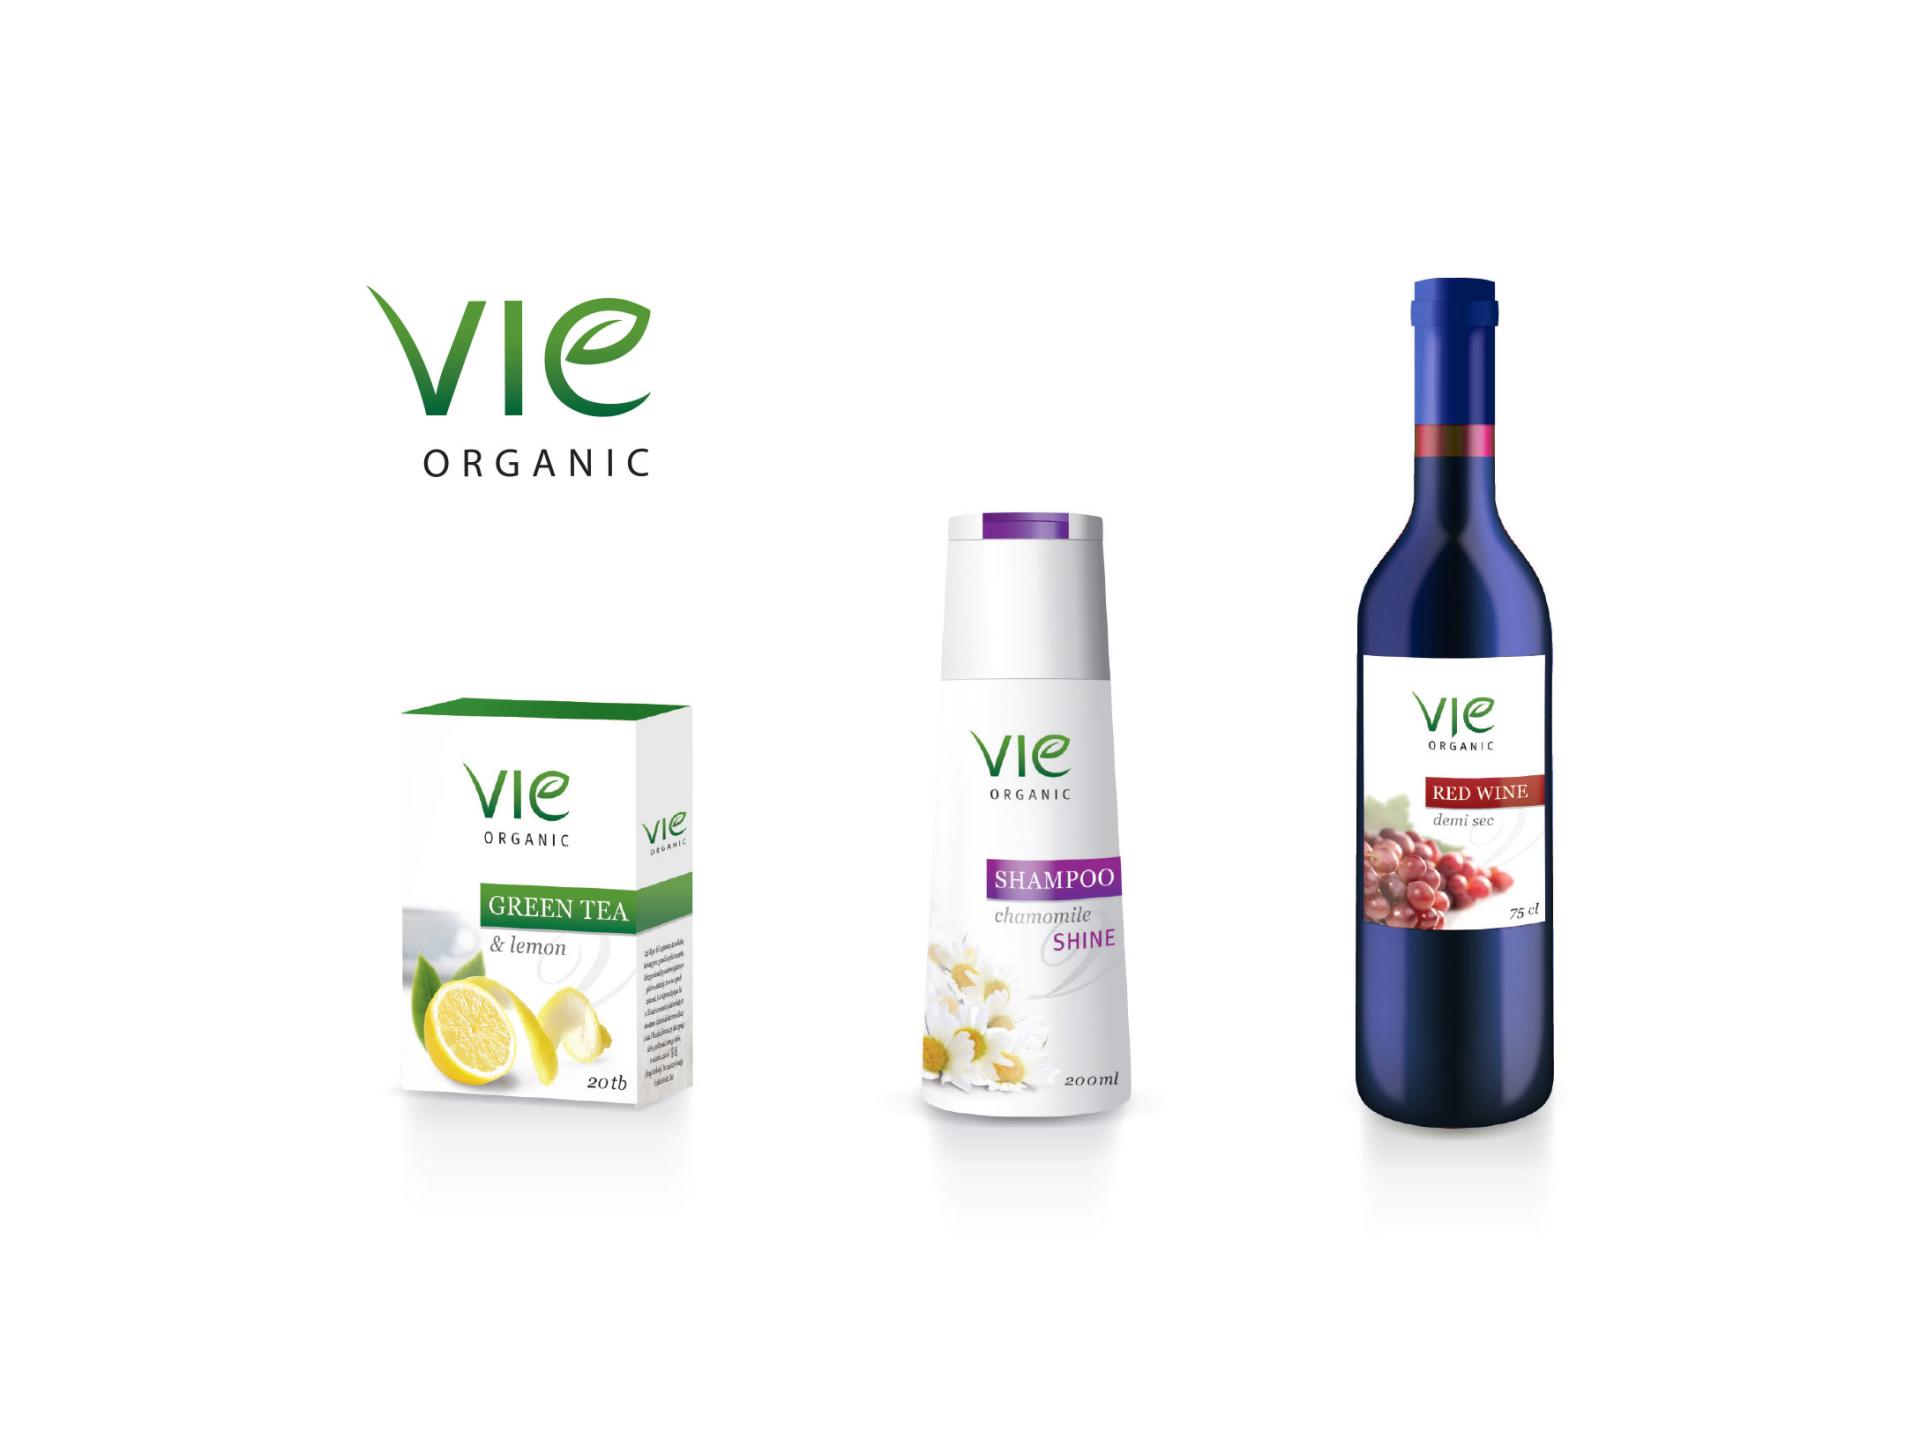 Vie Organic